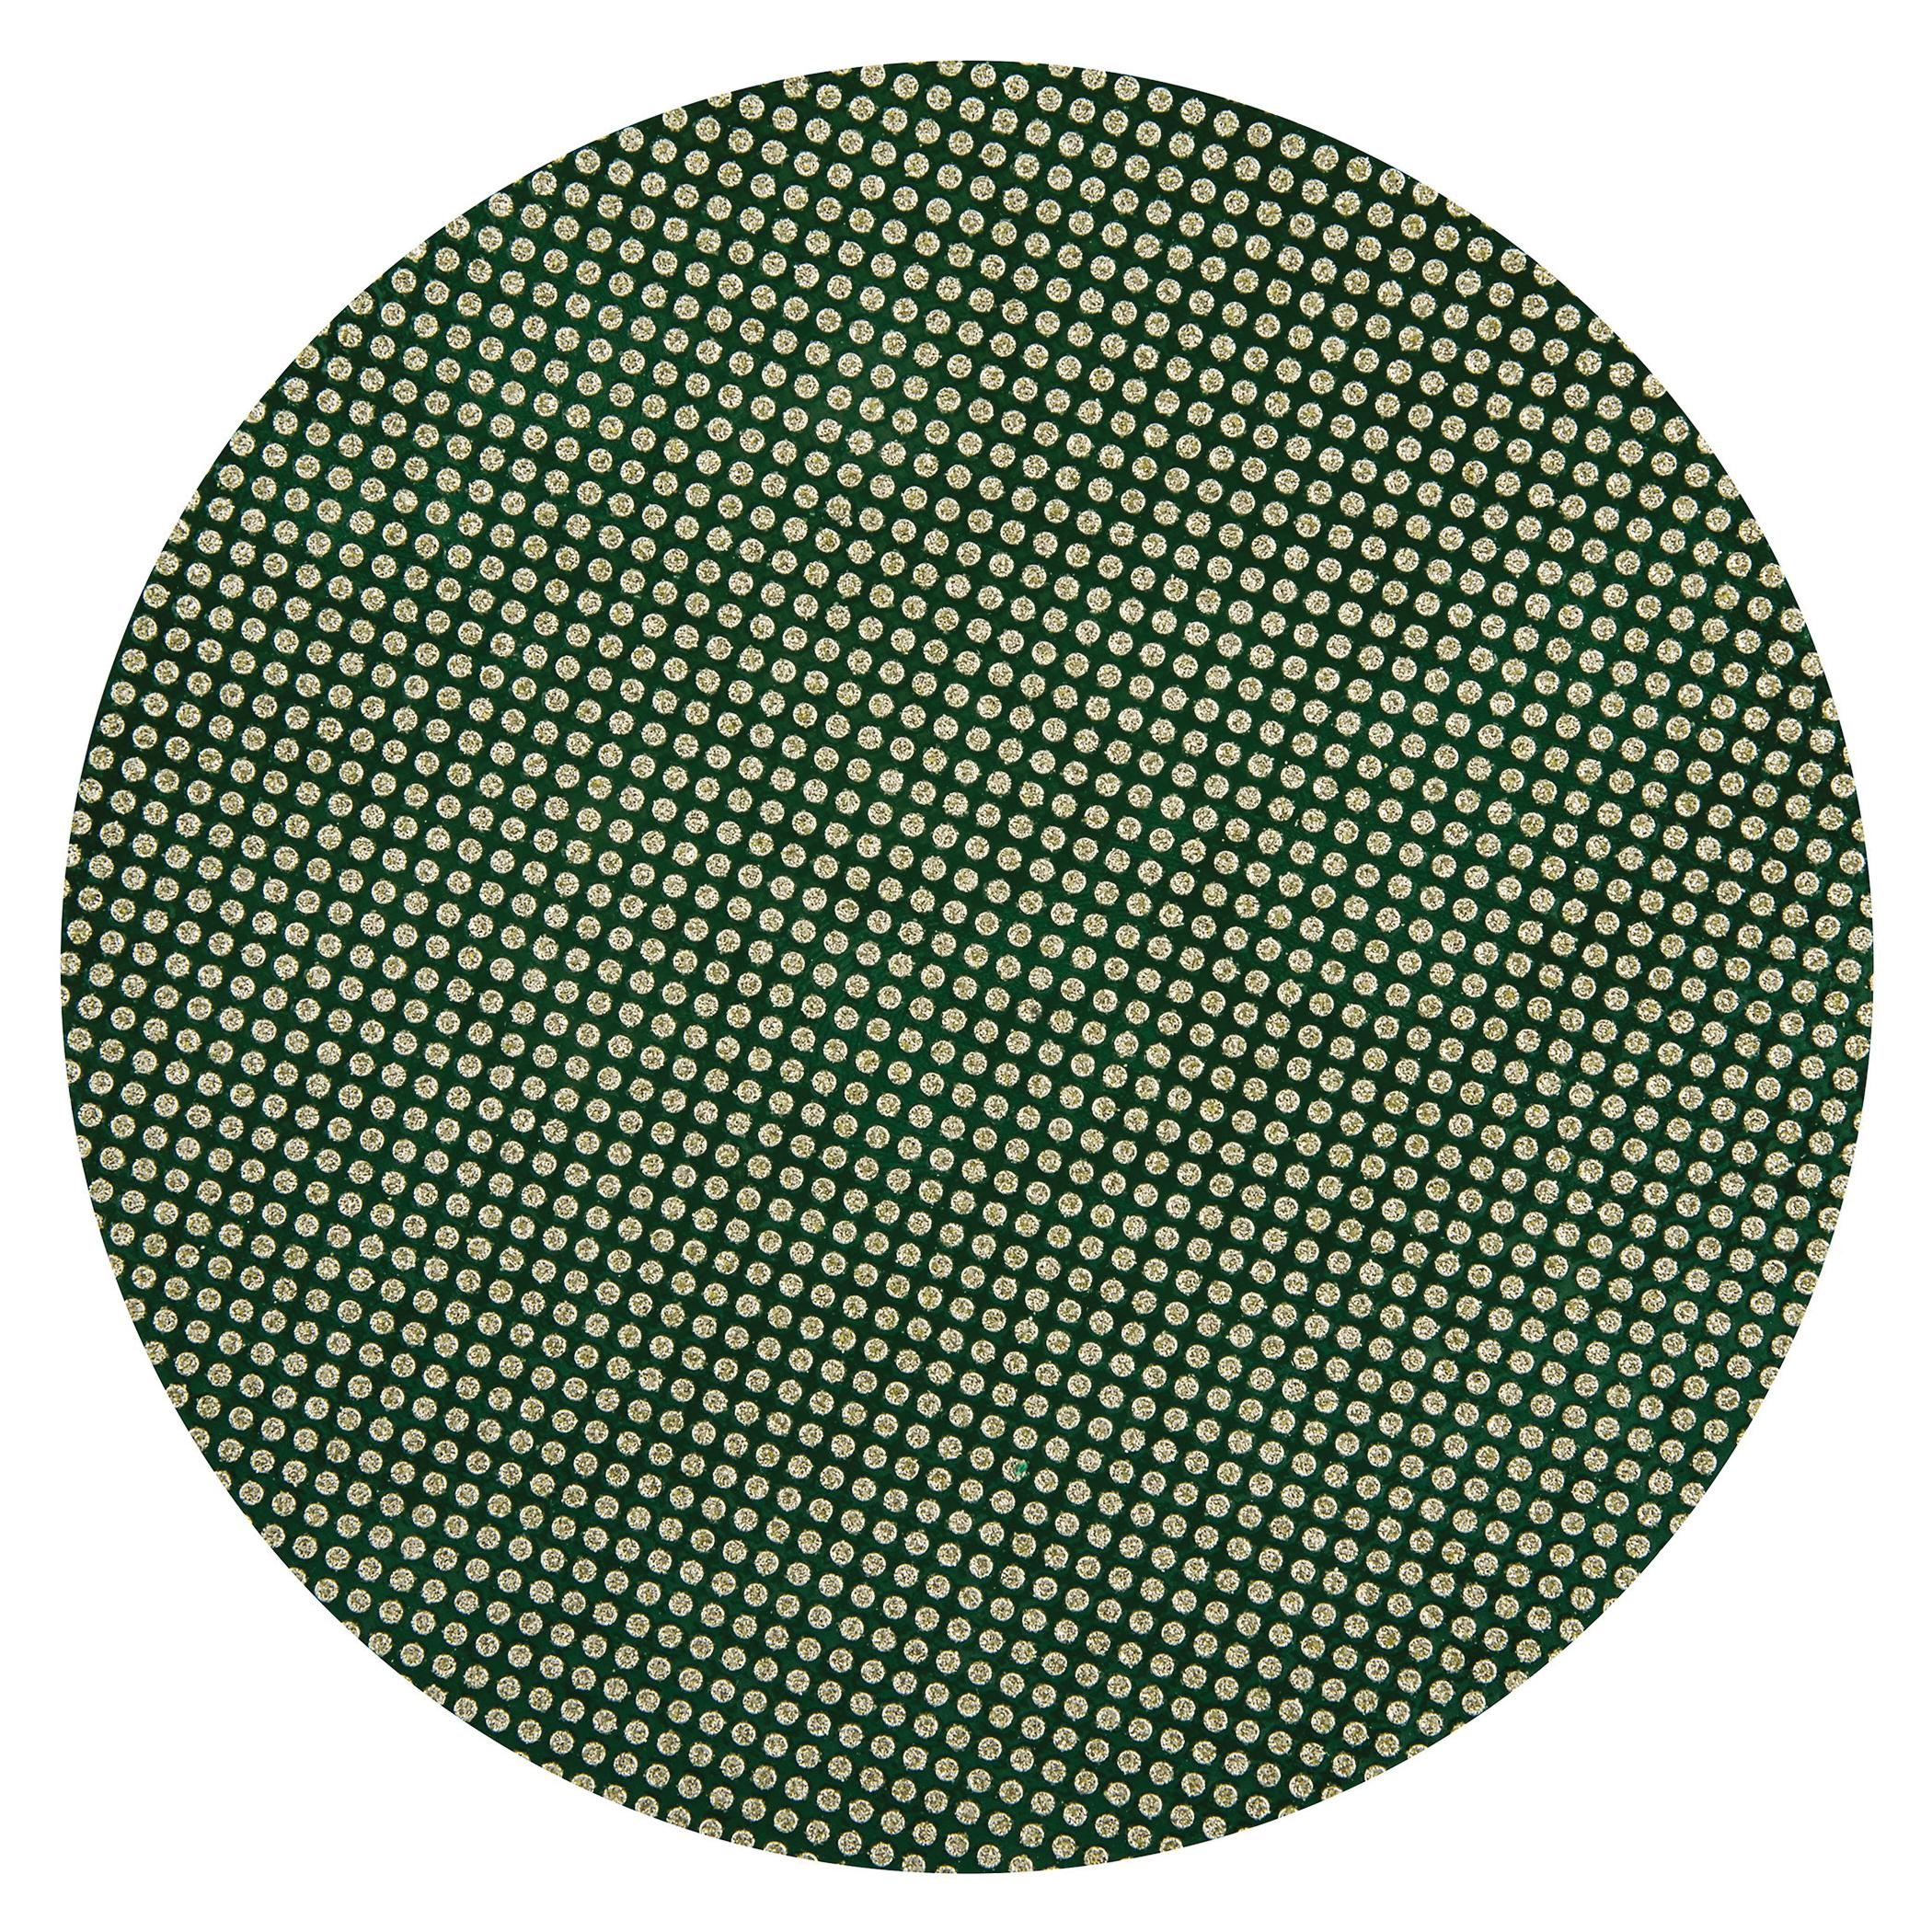 Norton® 66260306381 D71S Flexible Coated Abrasive Disc, 6 in Dia, 60 Grit, Coarse Grade, Diamond Abrasive